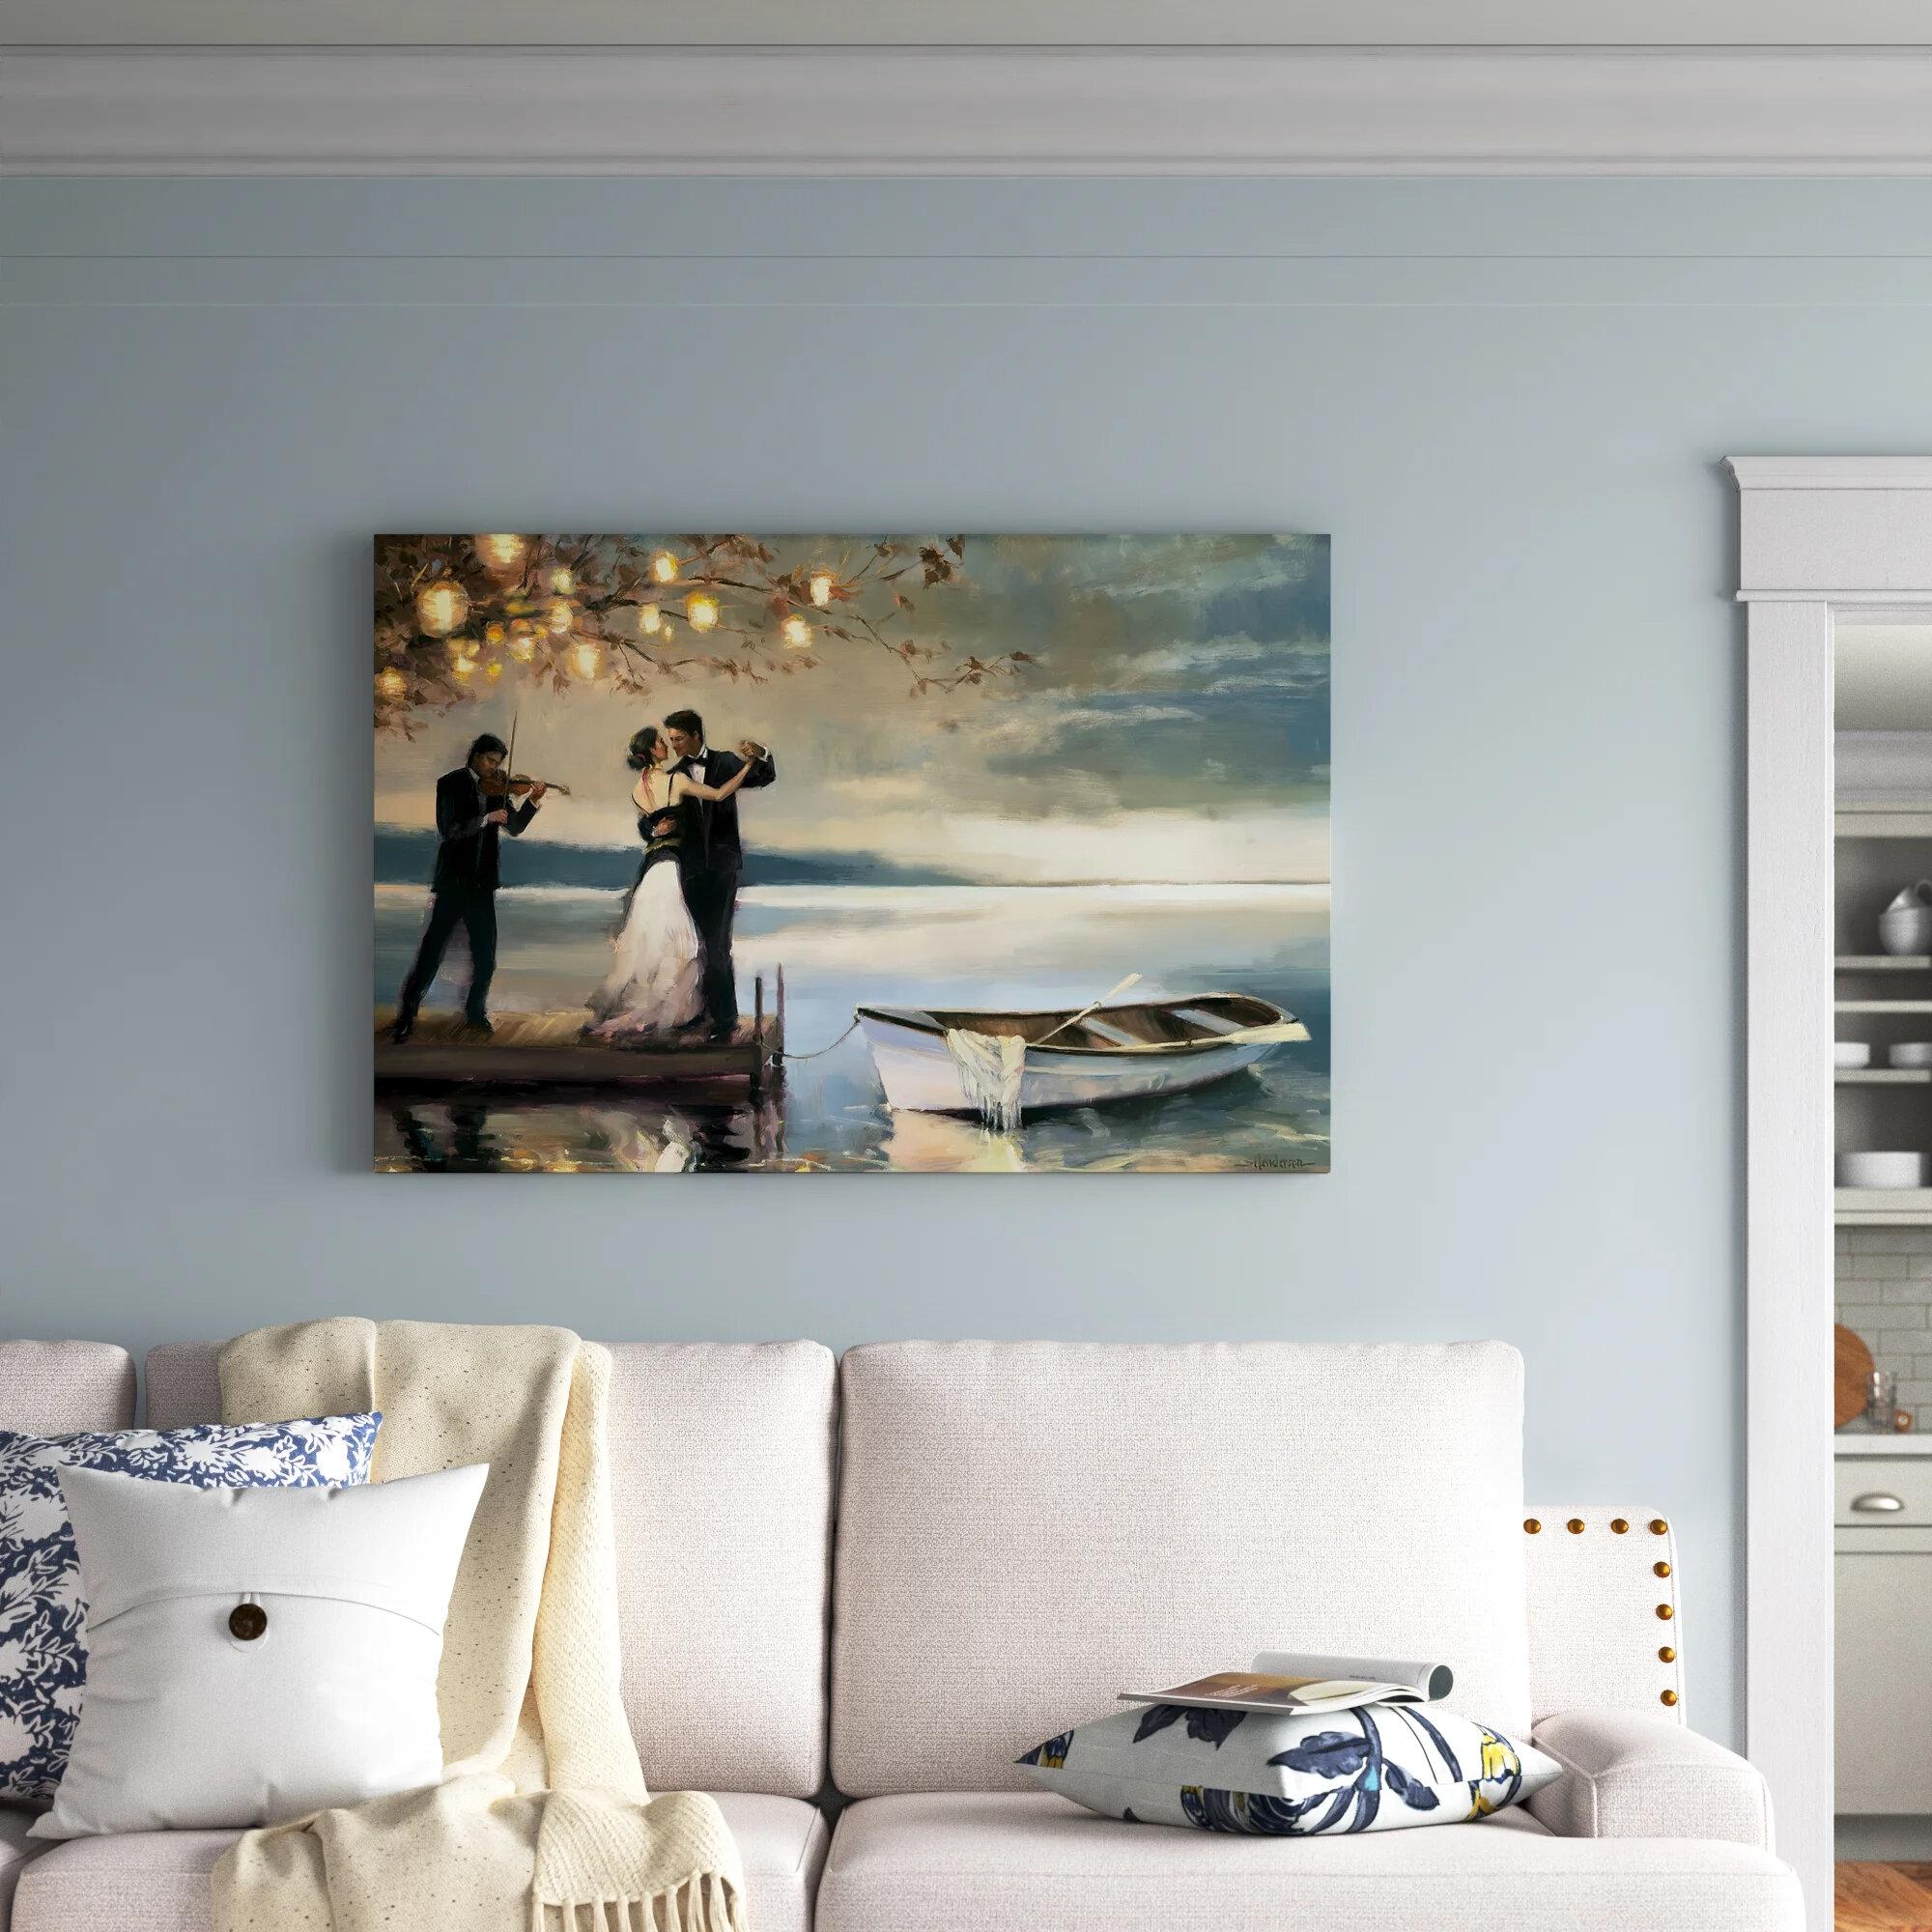 Banksy Art Canvas Painting Smile Girl Print Wall Art For Living Room Decor Gift